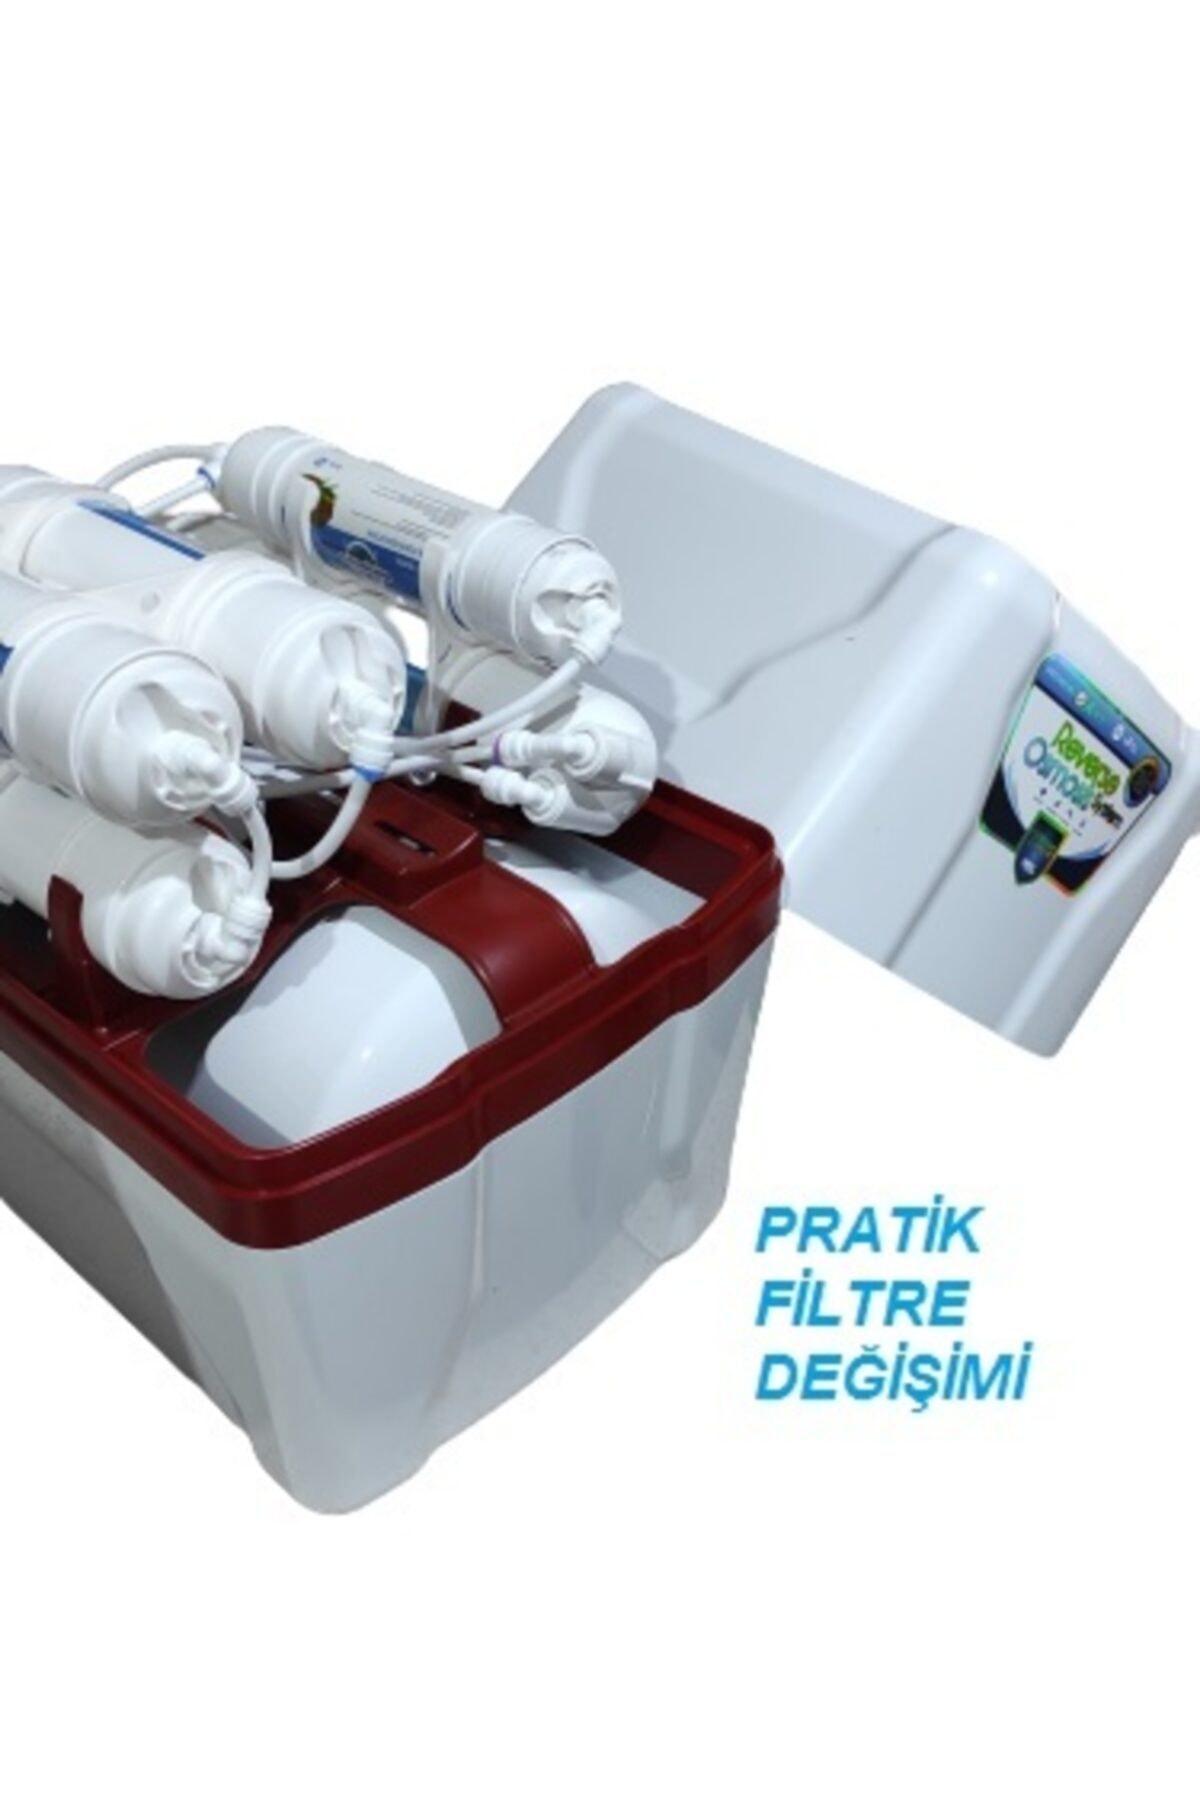 purewater Pure Water 8lt Metal Tanklı 5 Aşamalı Su Arıtma Cihazı